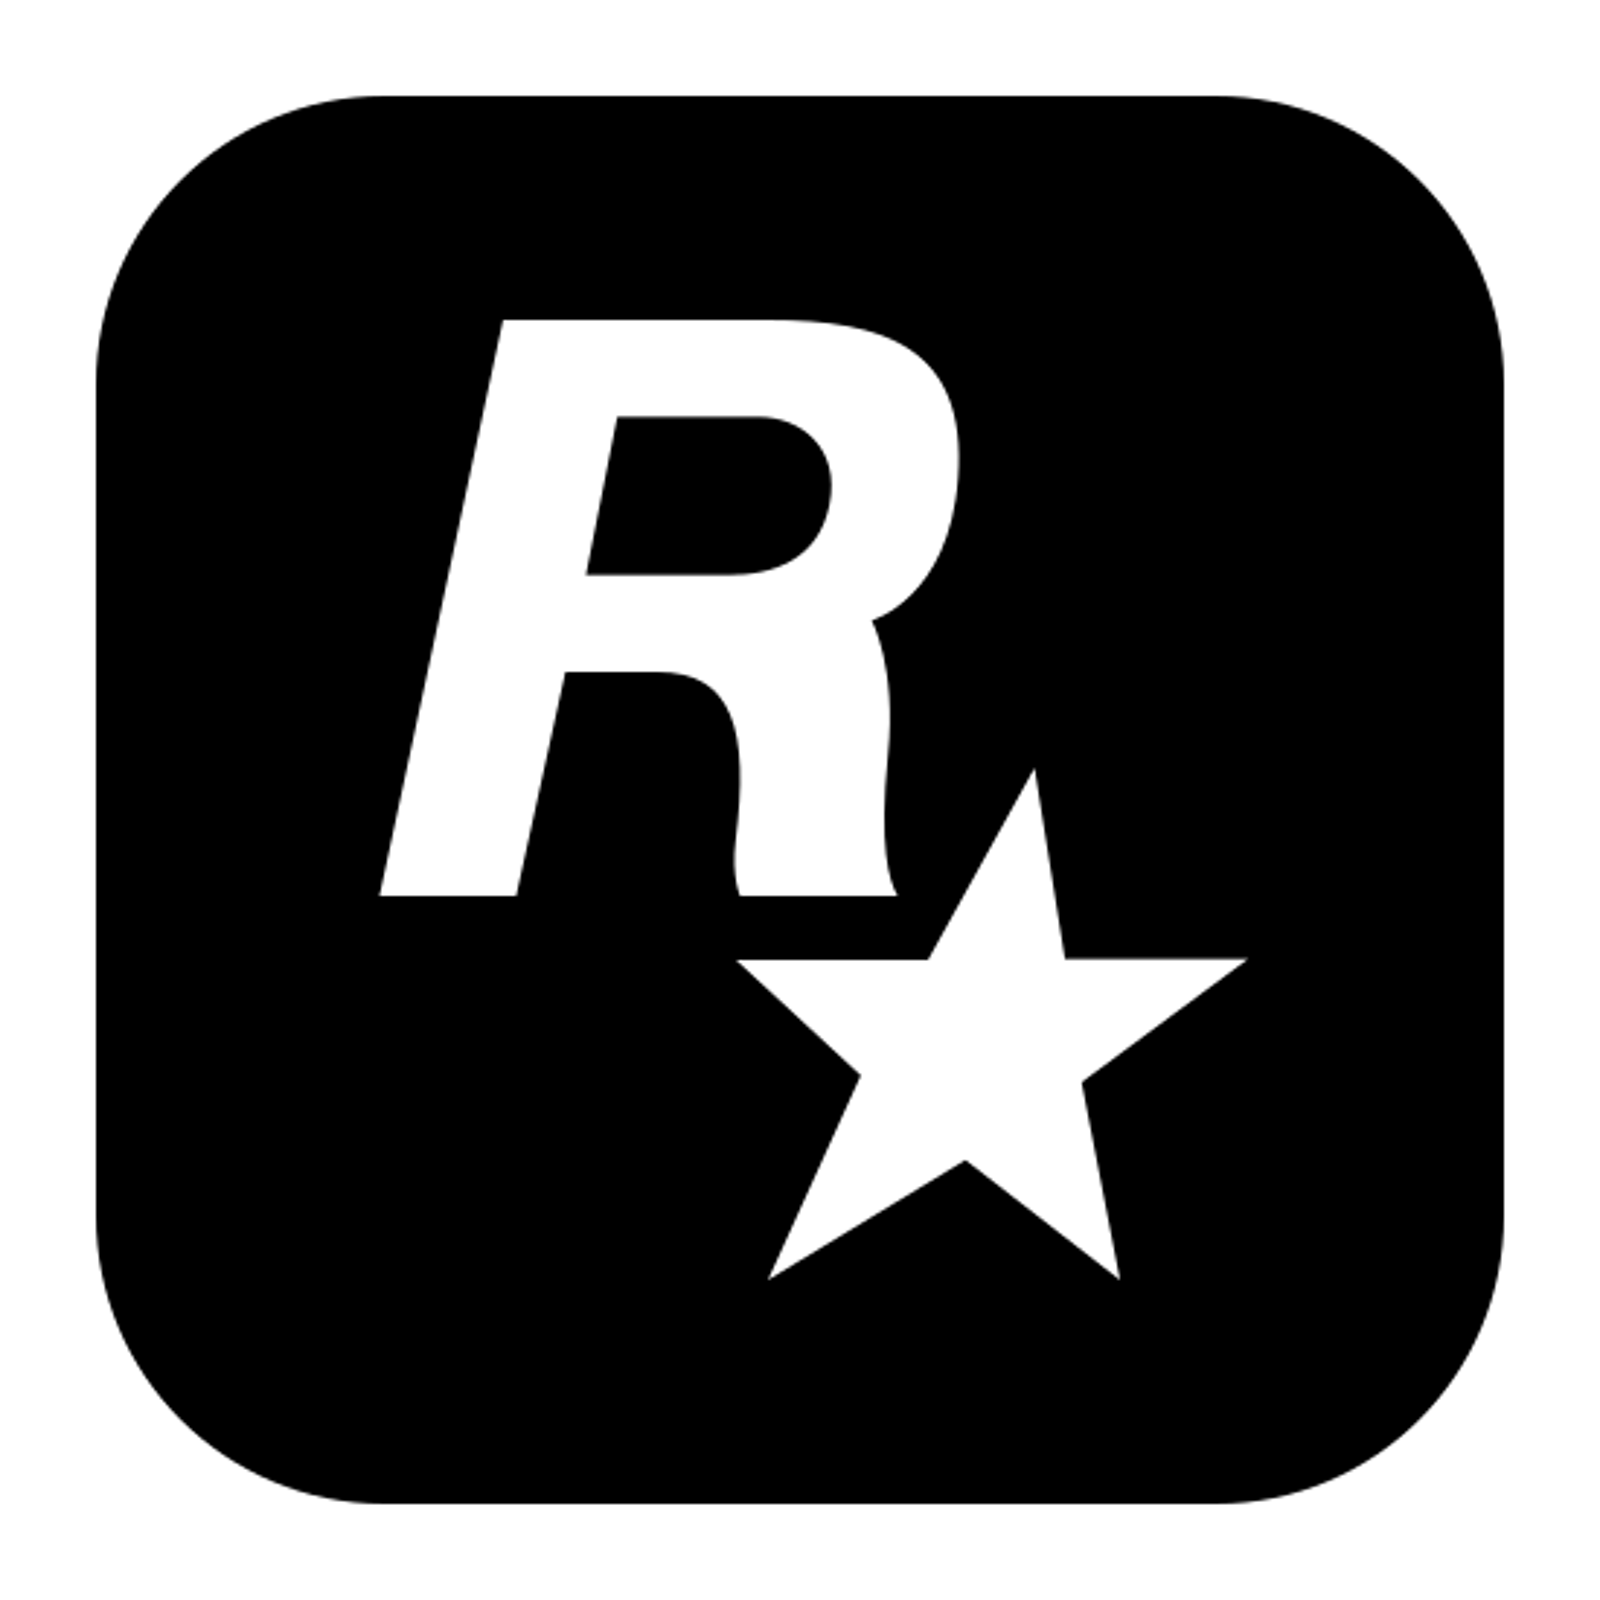 Rockstar Games Filled icon